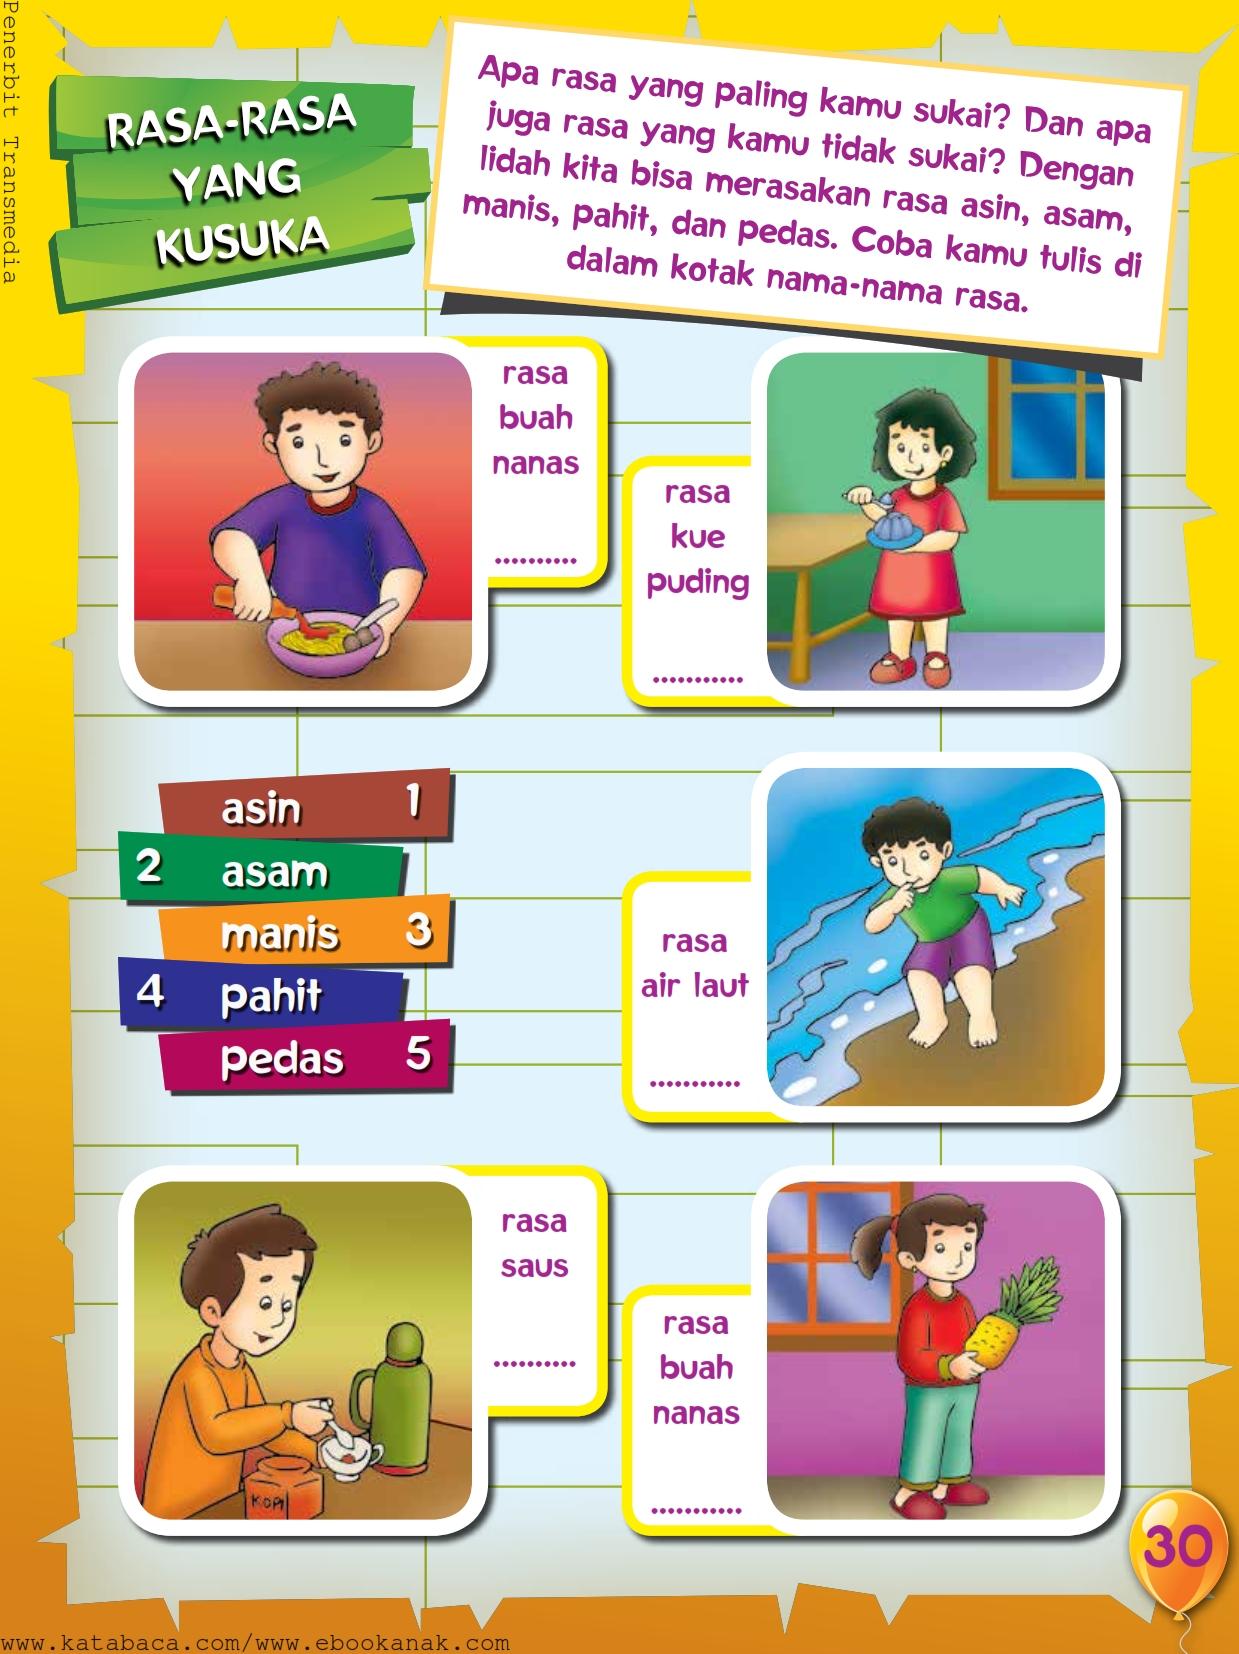 baca buku online, buku aktivitas anak jenius TK A B_033 mengenal nama-nama rasa